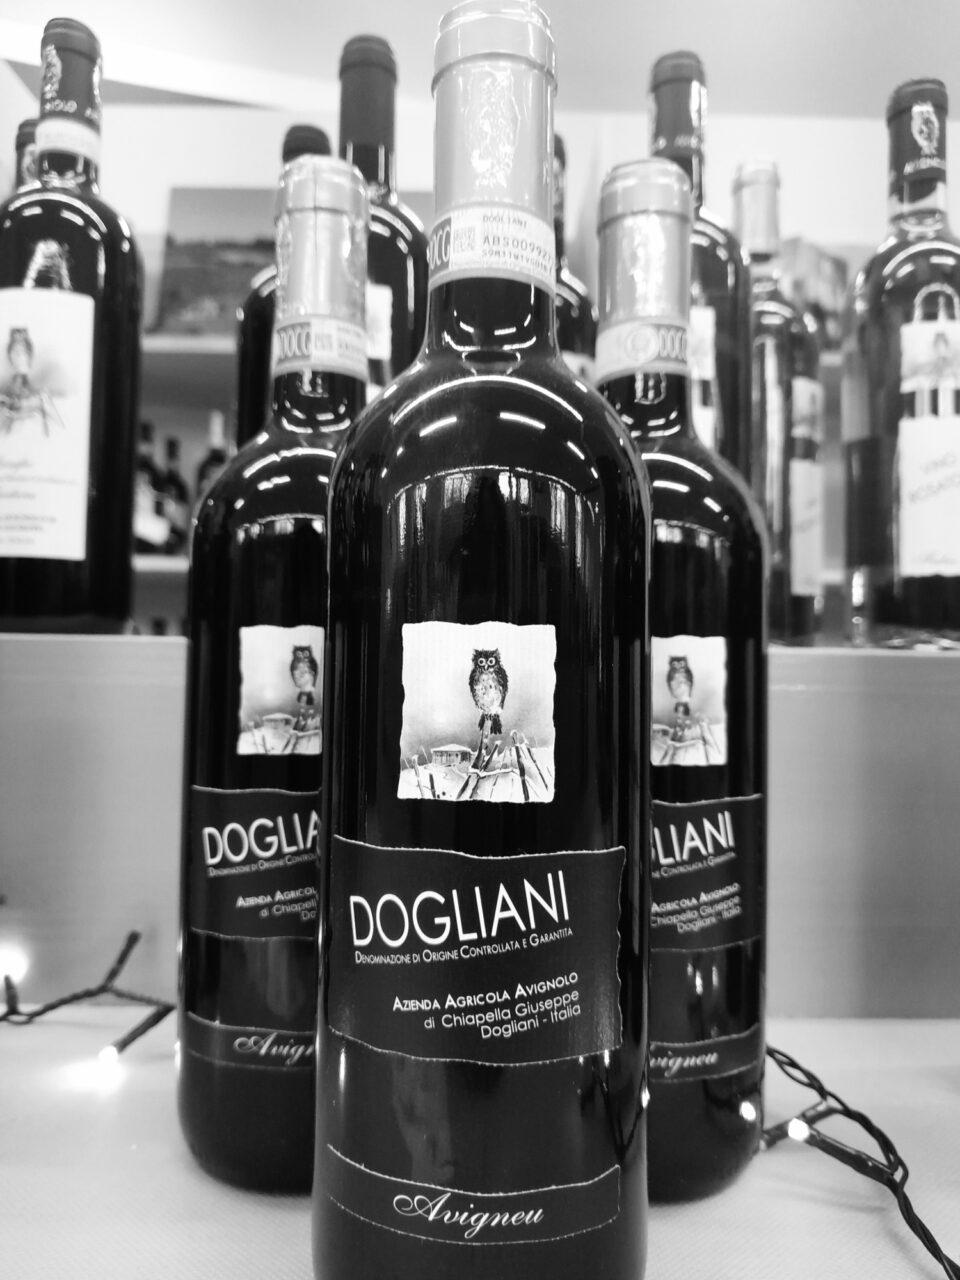 bottiglie di Dogliani DOCG Avigneu